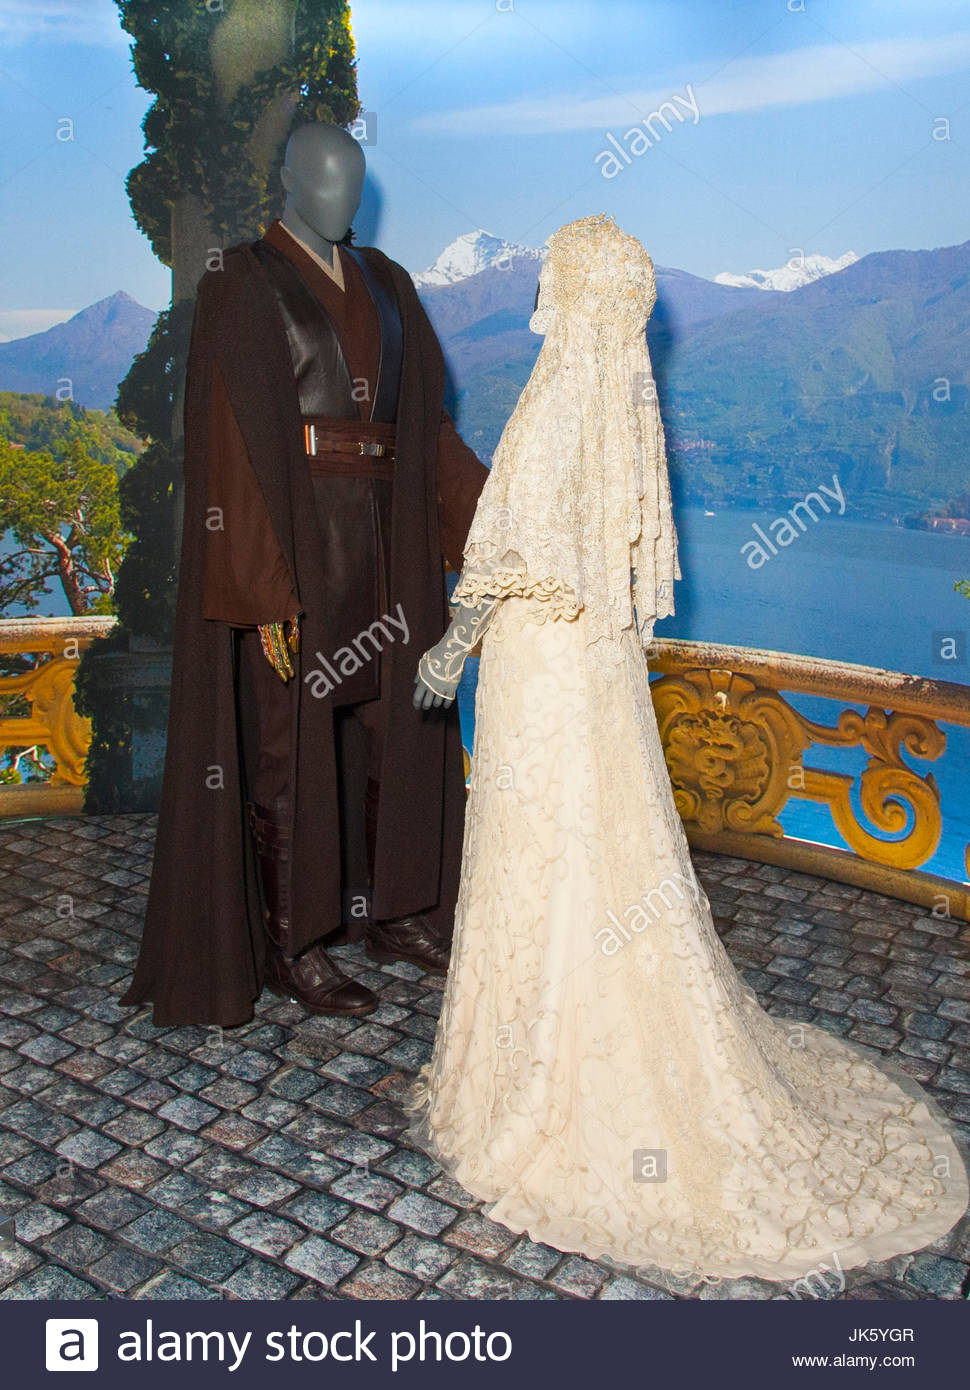 Star Wars Costume Exhibition Anakin Skywalker Jedi Robes Padme Amidala Wedding Gown